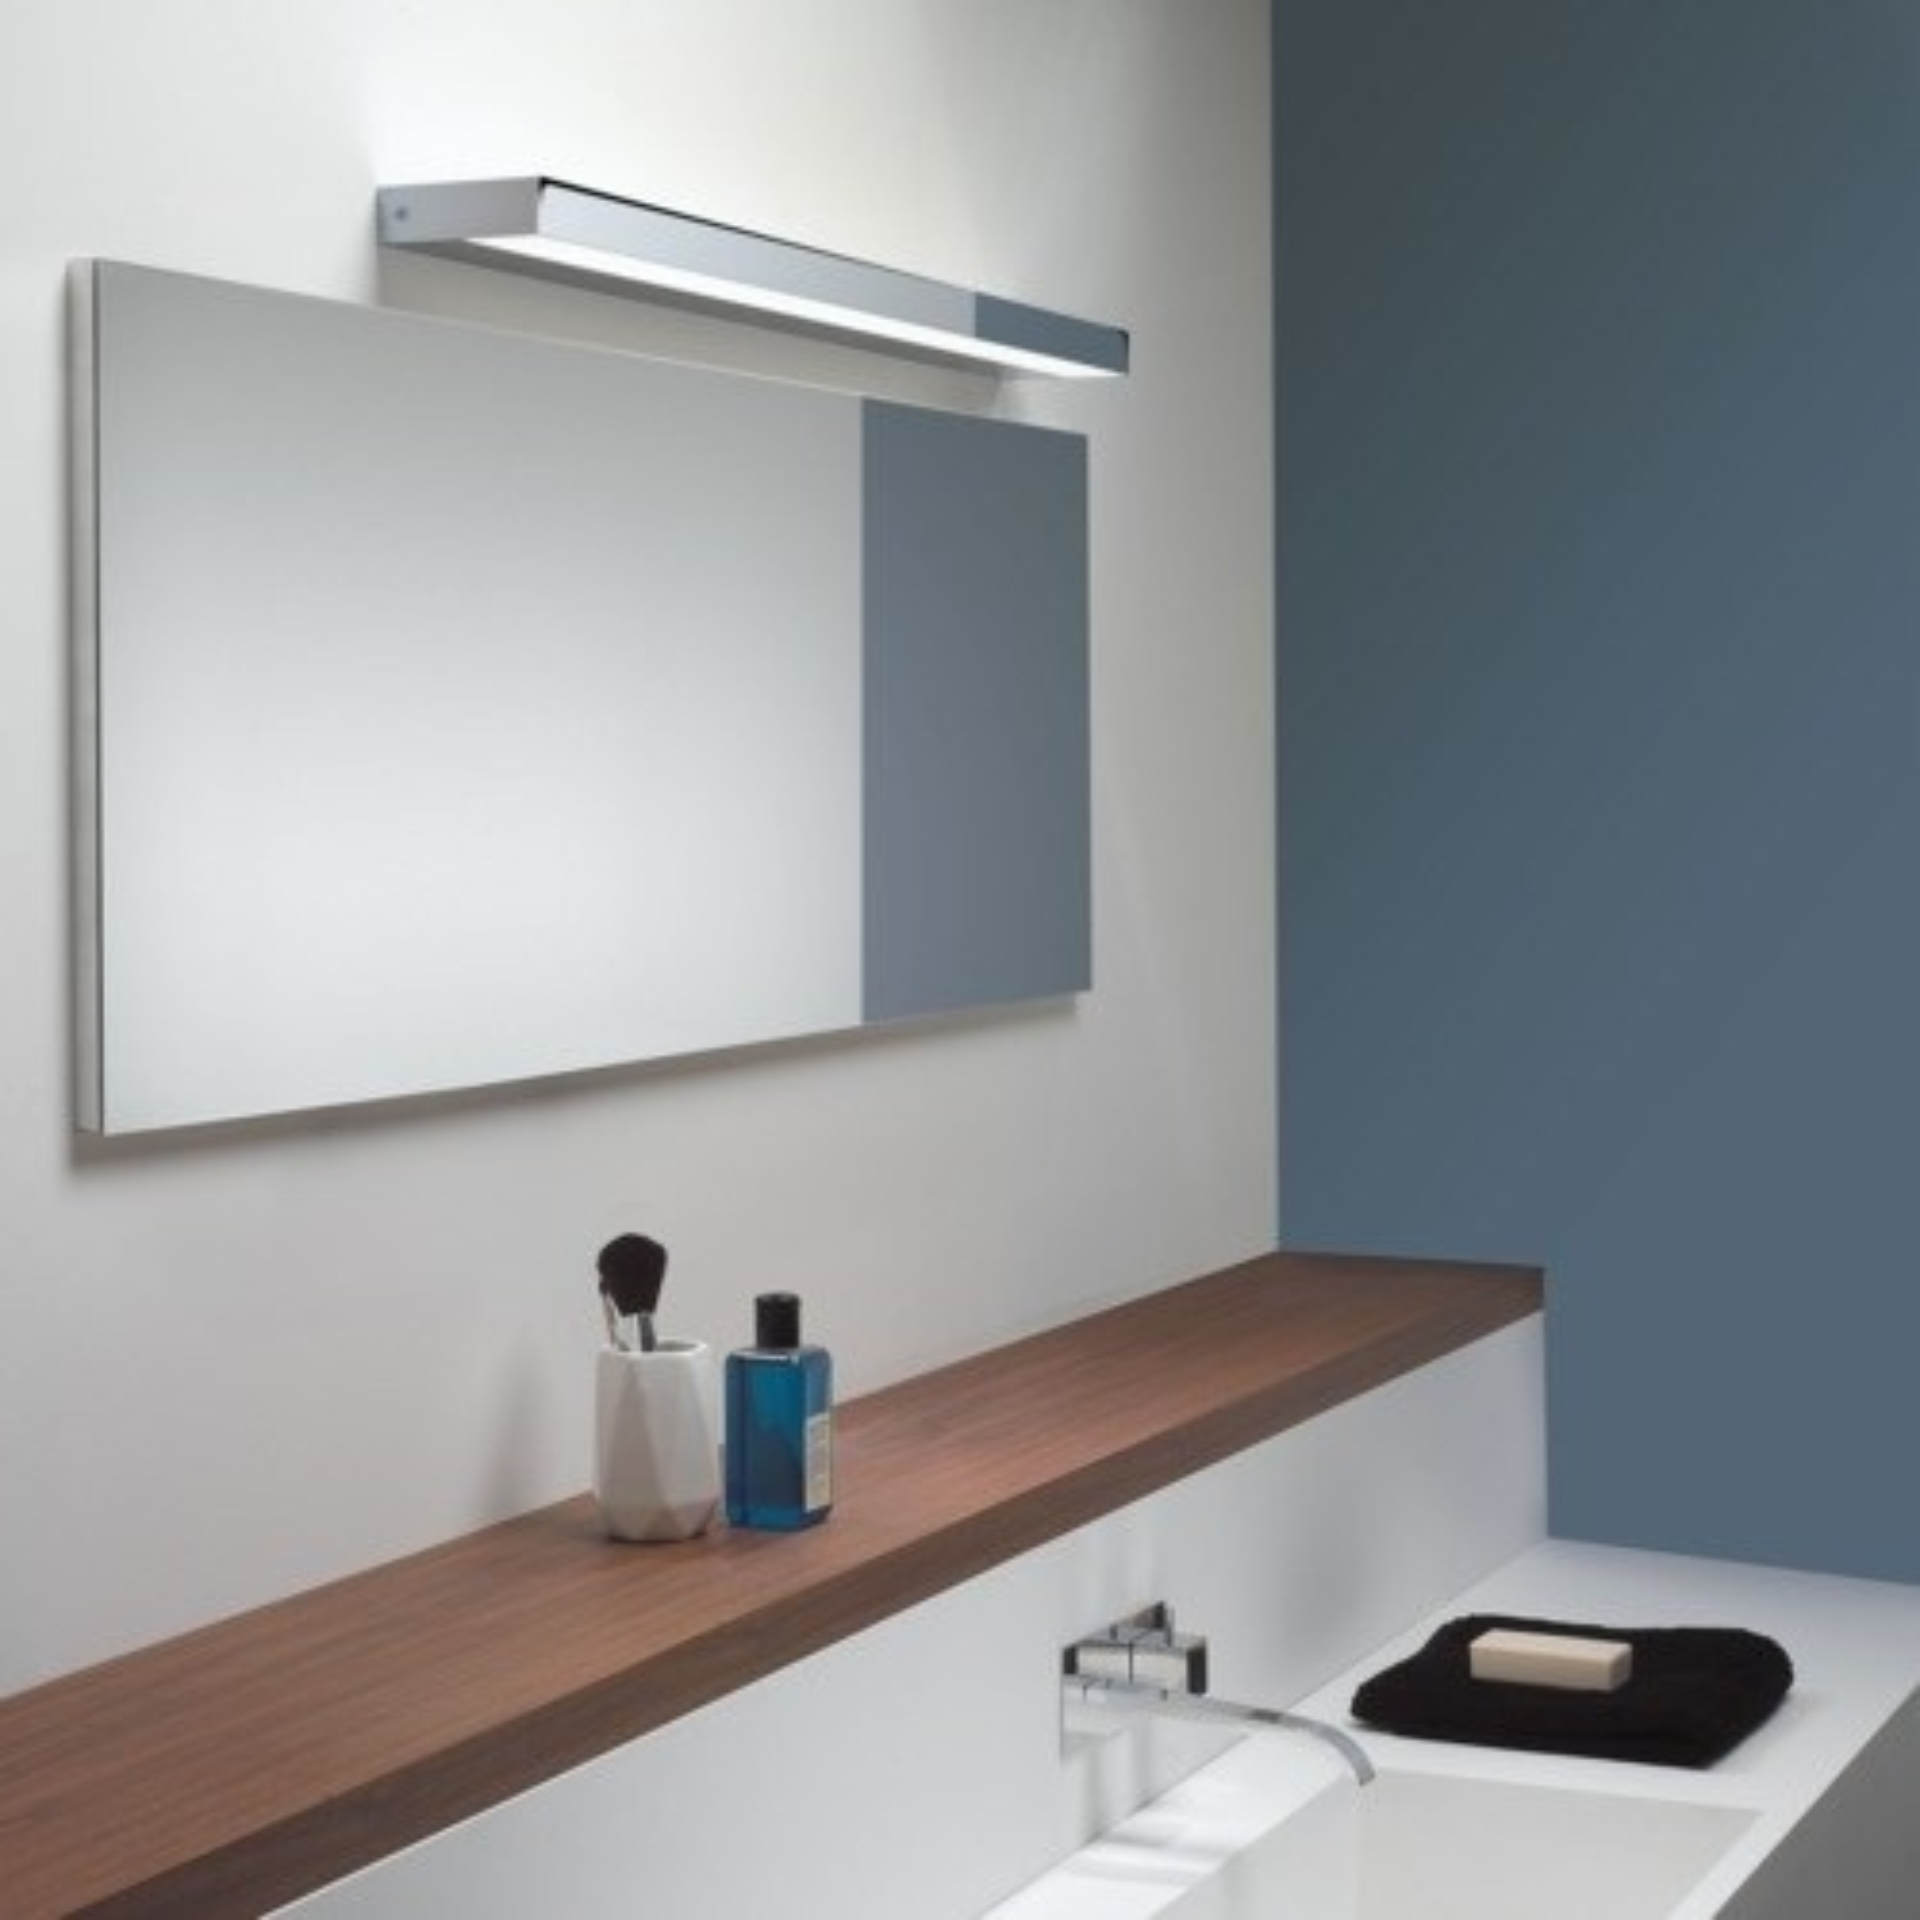 Axios | Badezimmer-Wandleuchte | LED | 900mm | Perfecto design